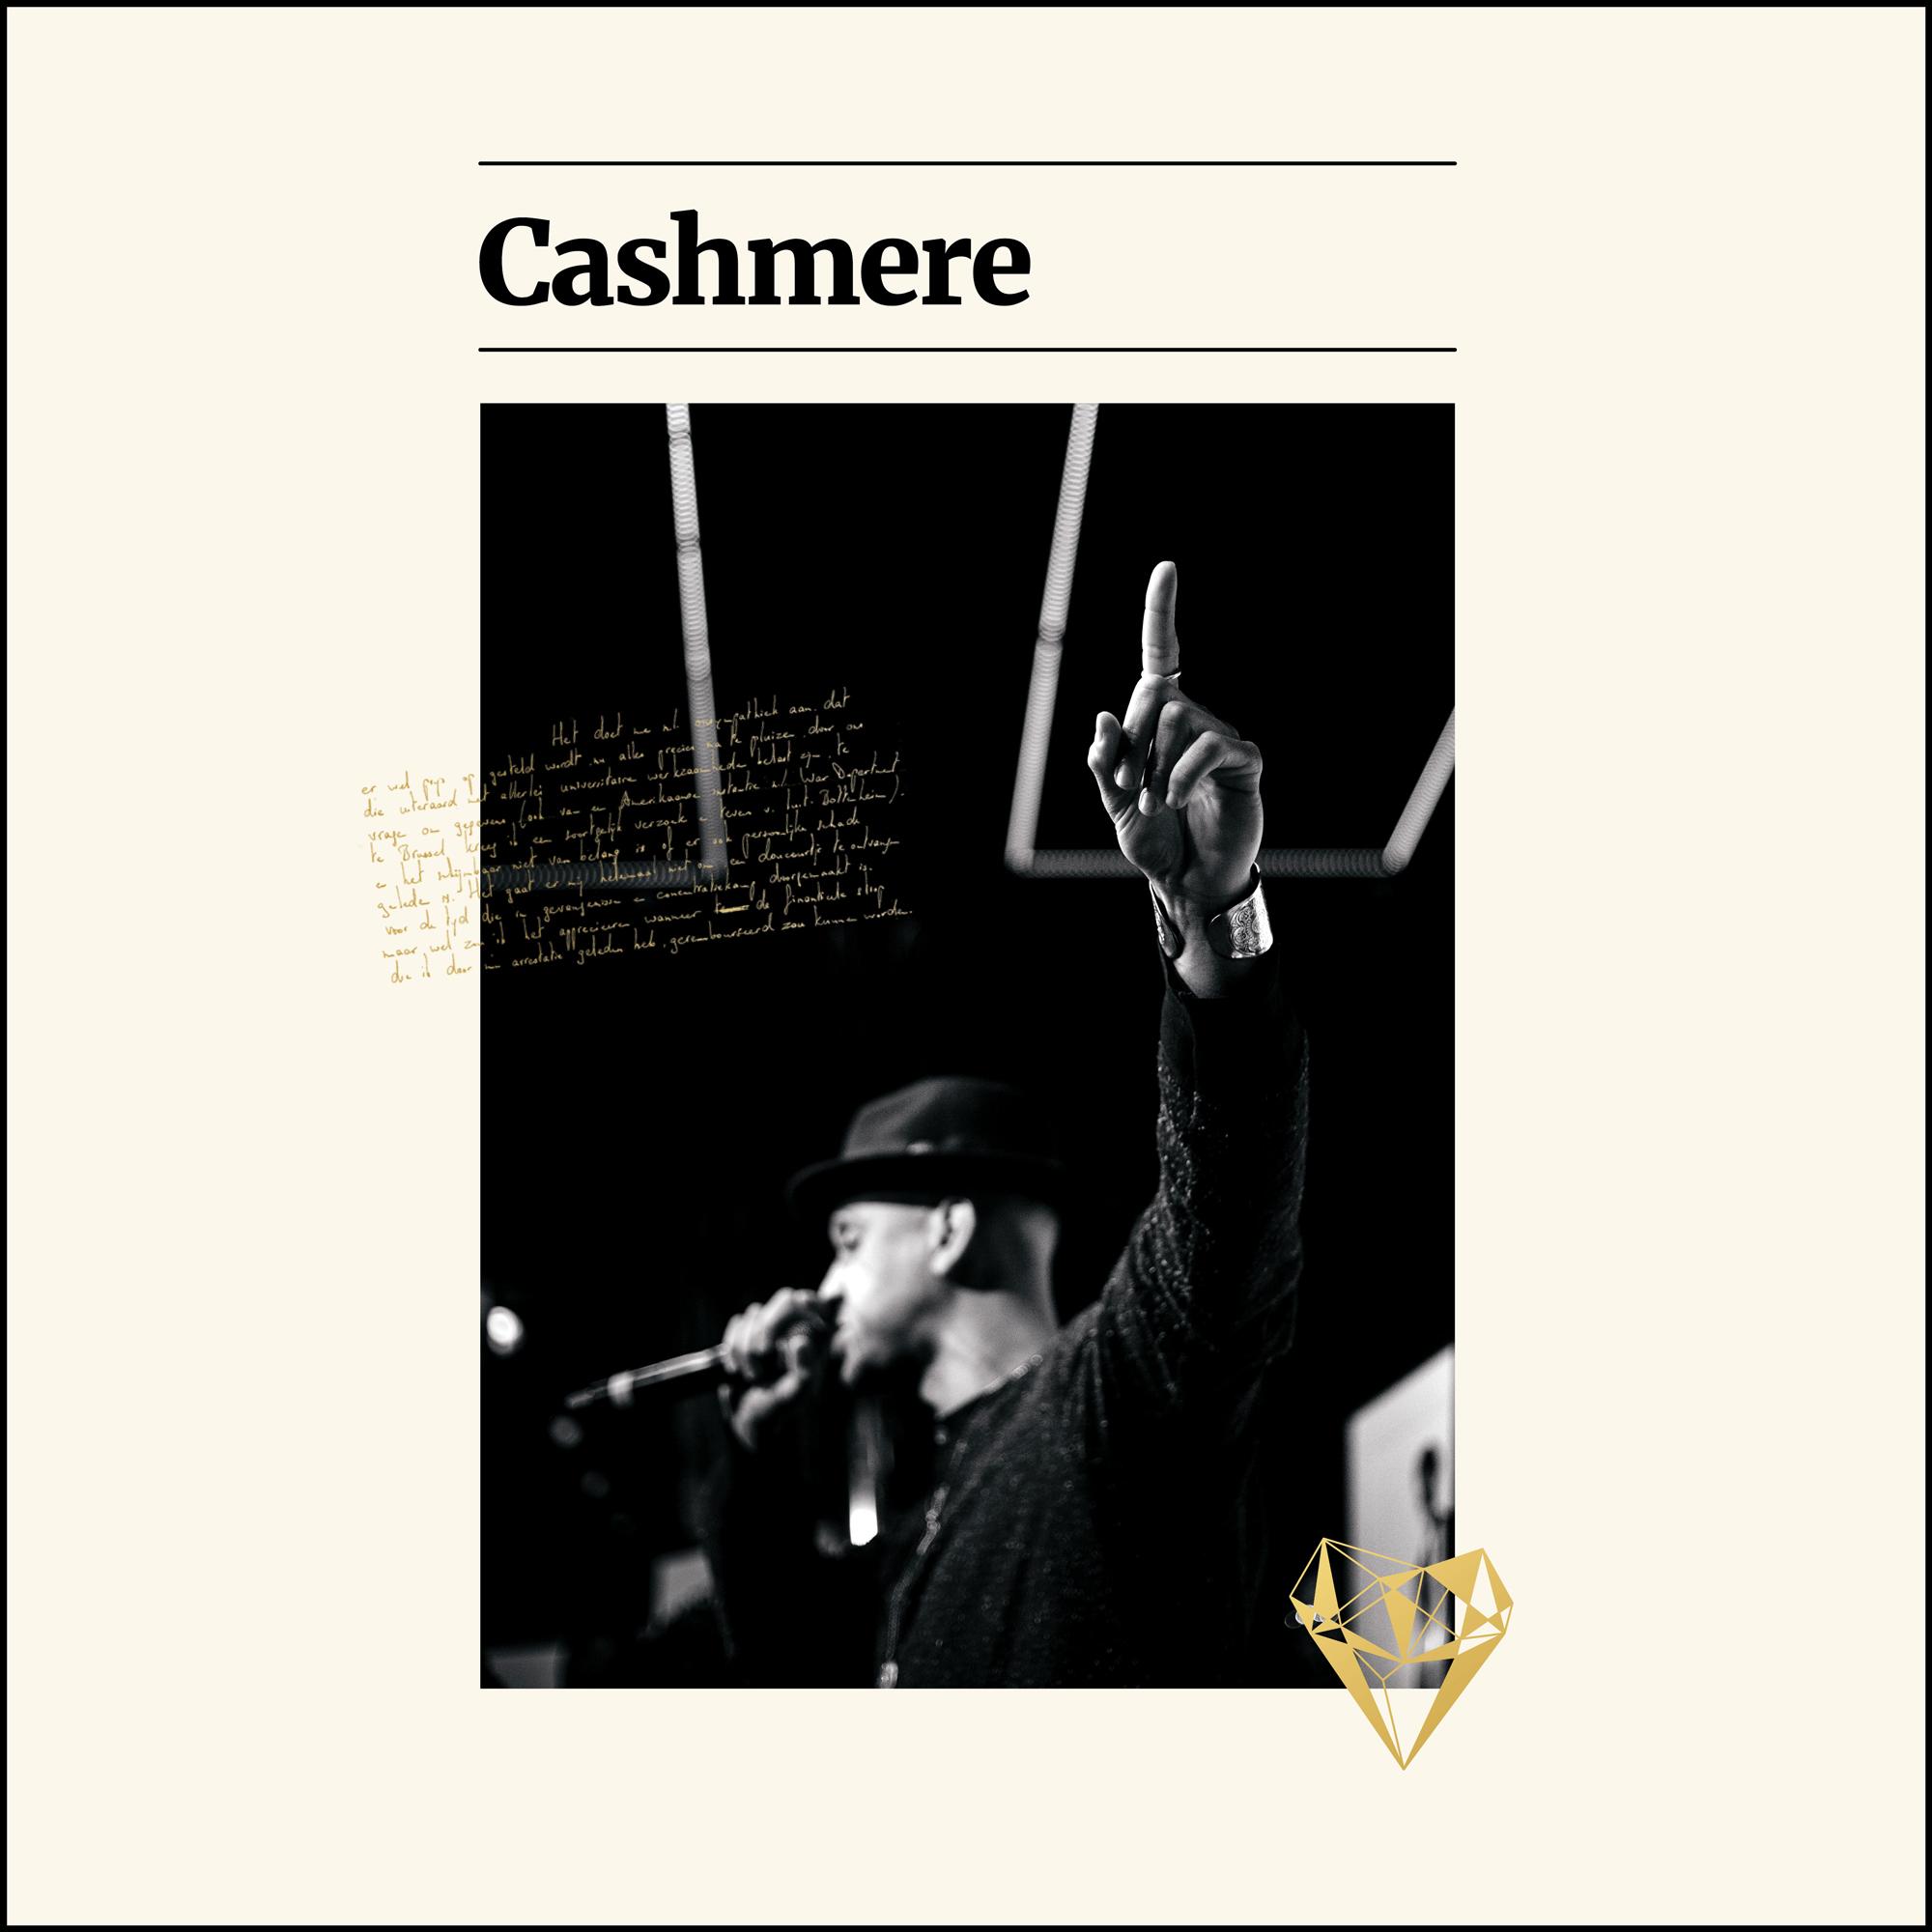 Cashmere-ep.jpg